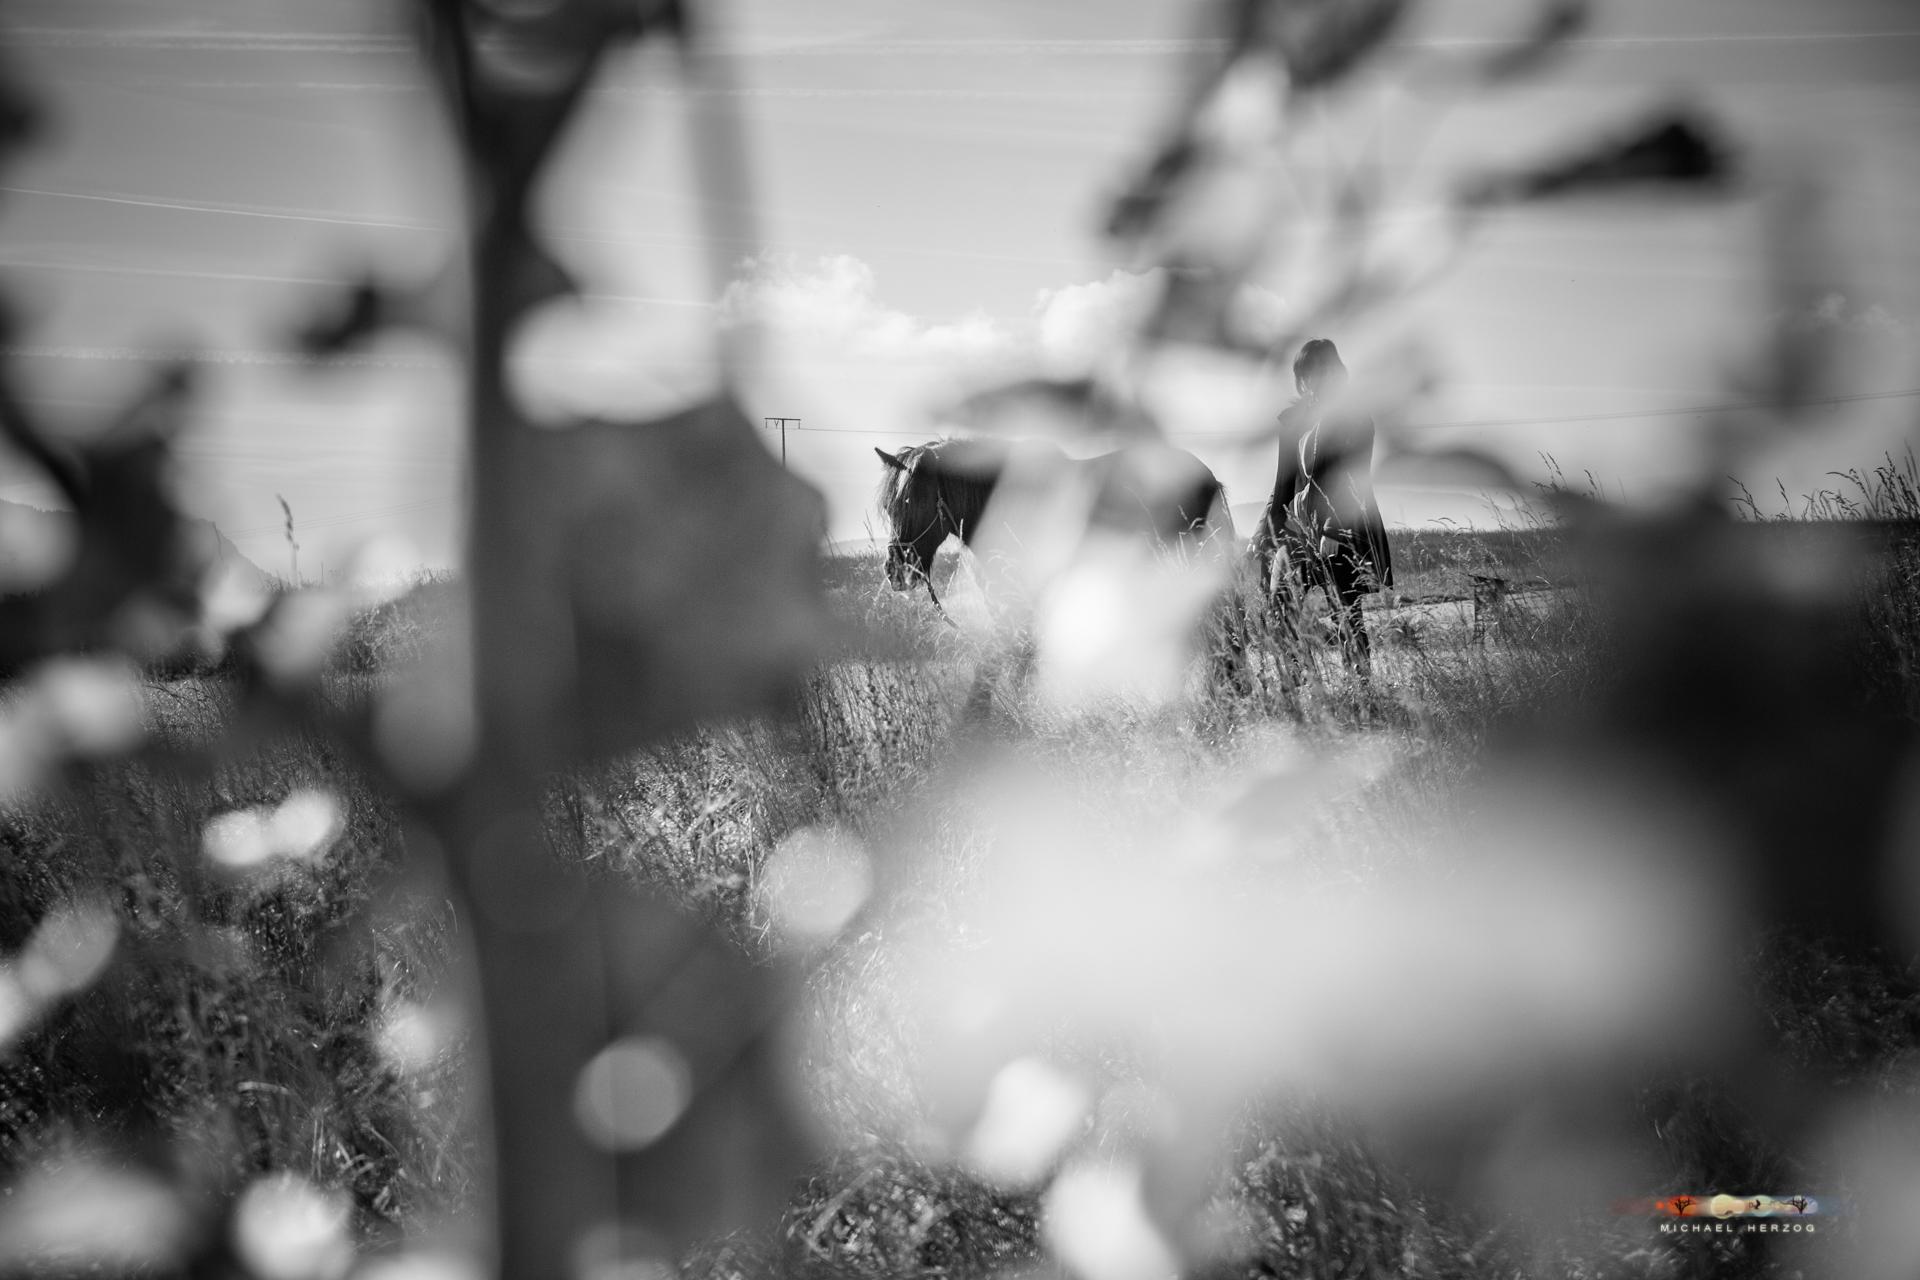 Pferd_Sonja_MichaelHerzog_web-8246.jpg